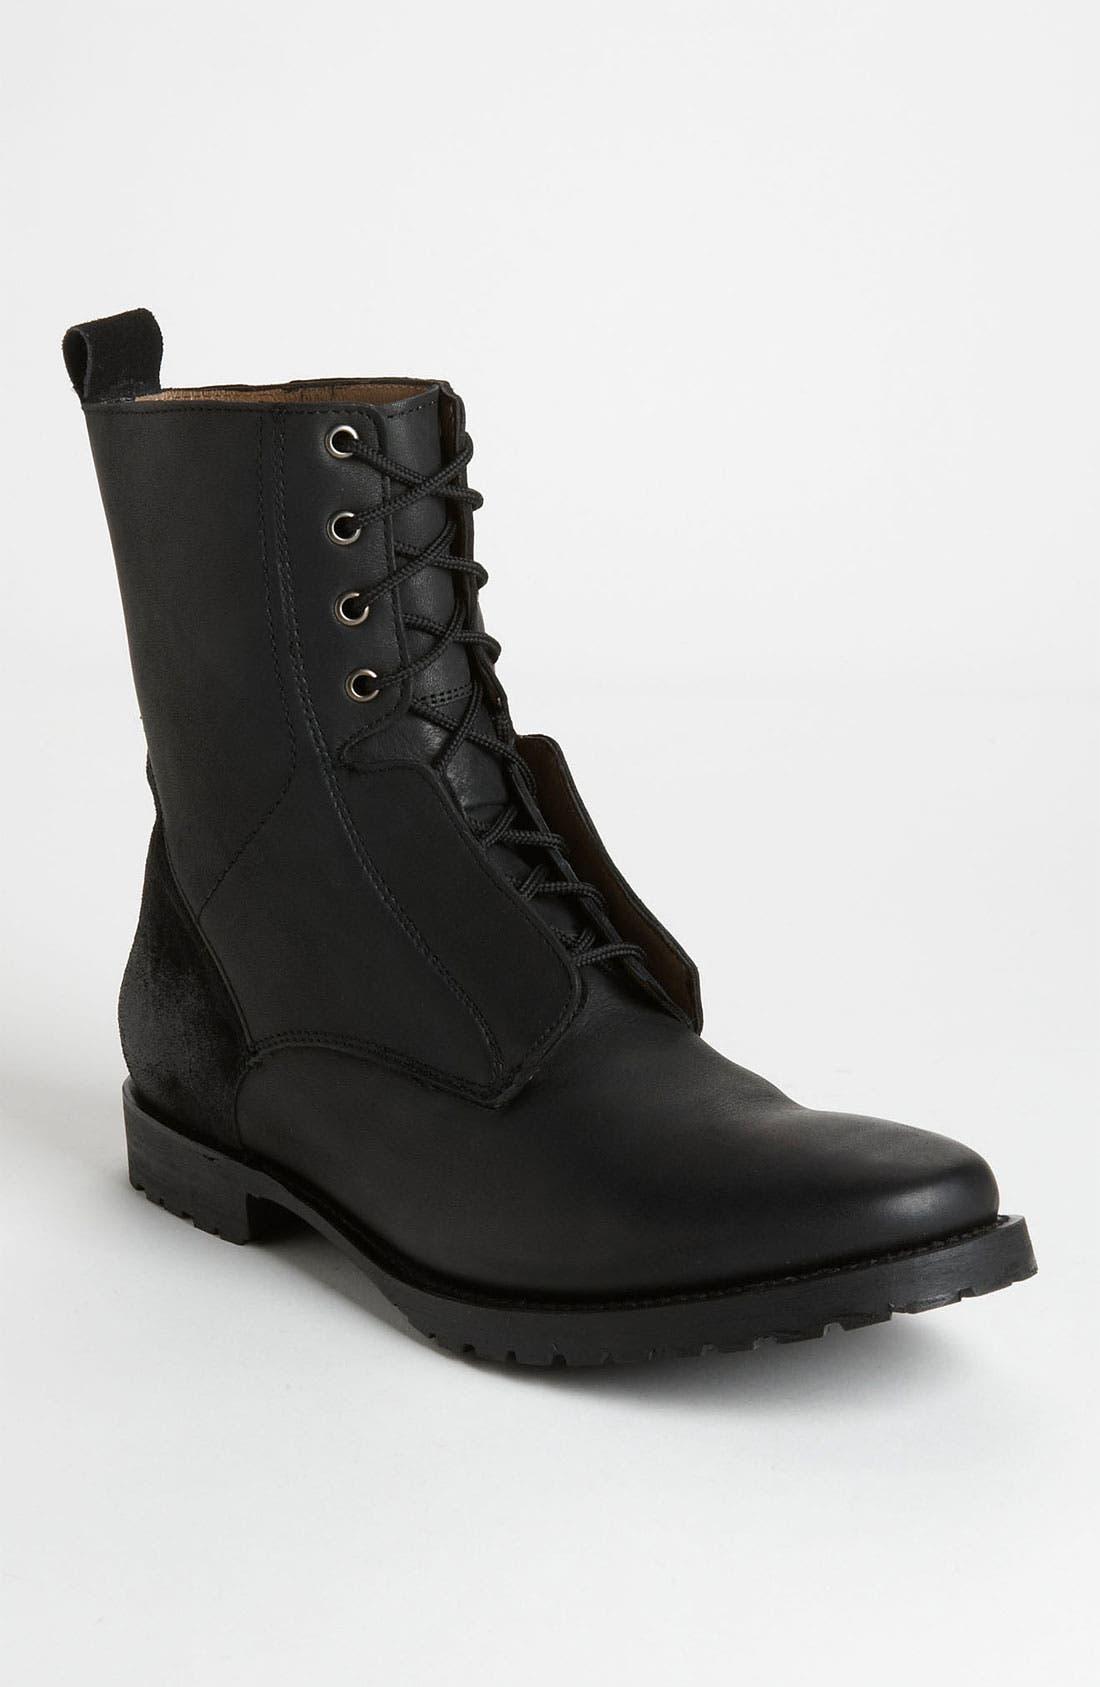 Alternate Image 1 Selected - J.D. Fisk 'Locke' Plain Toe Boot